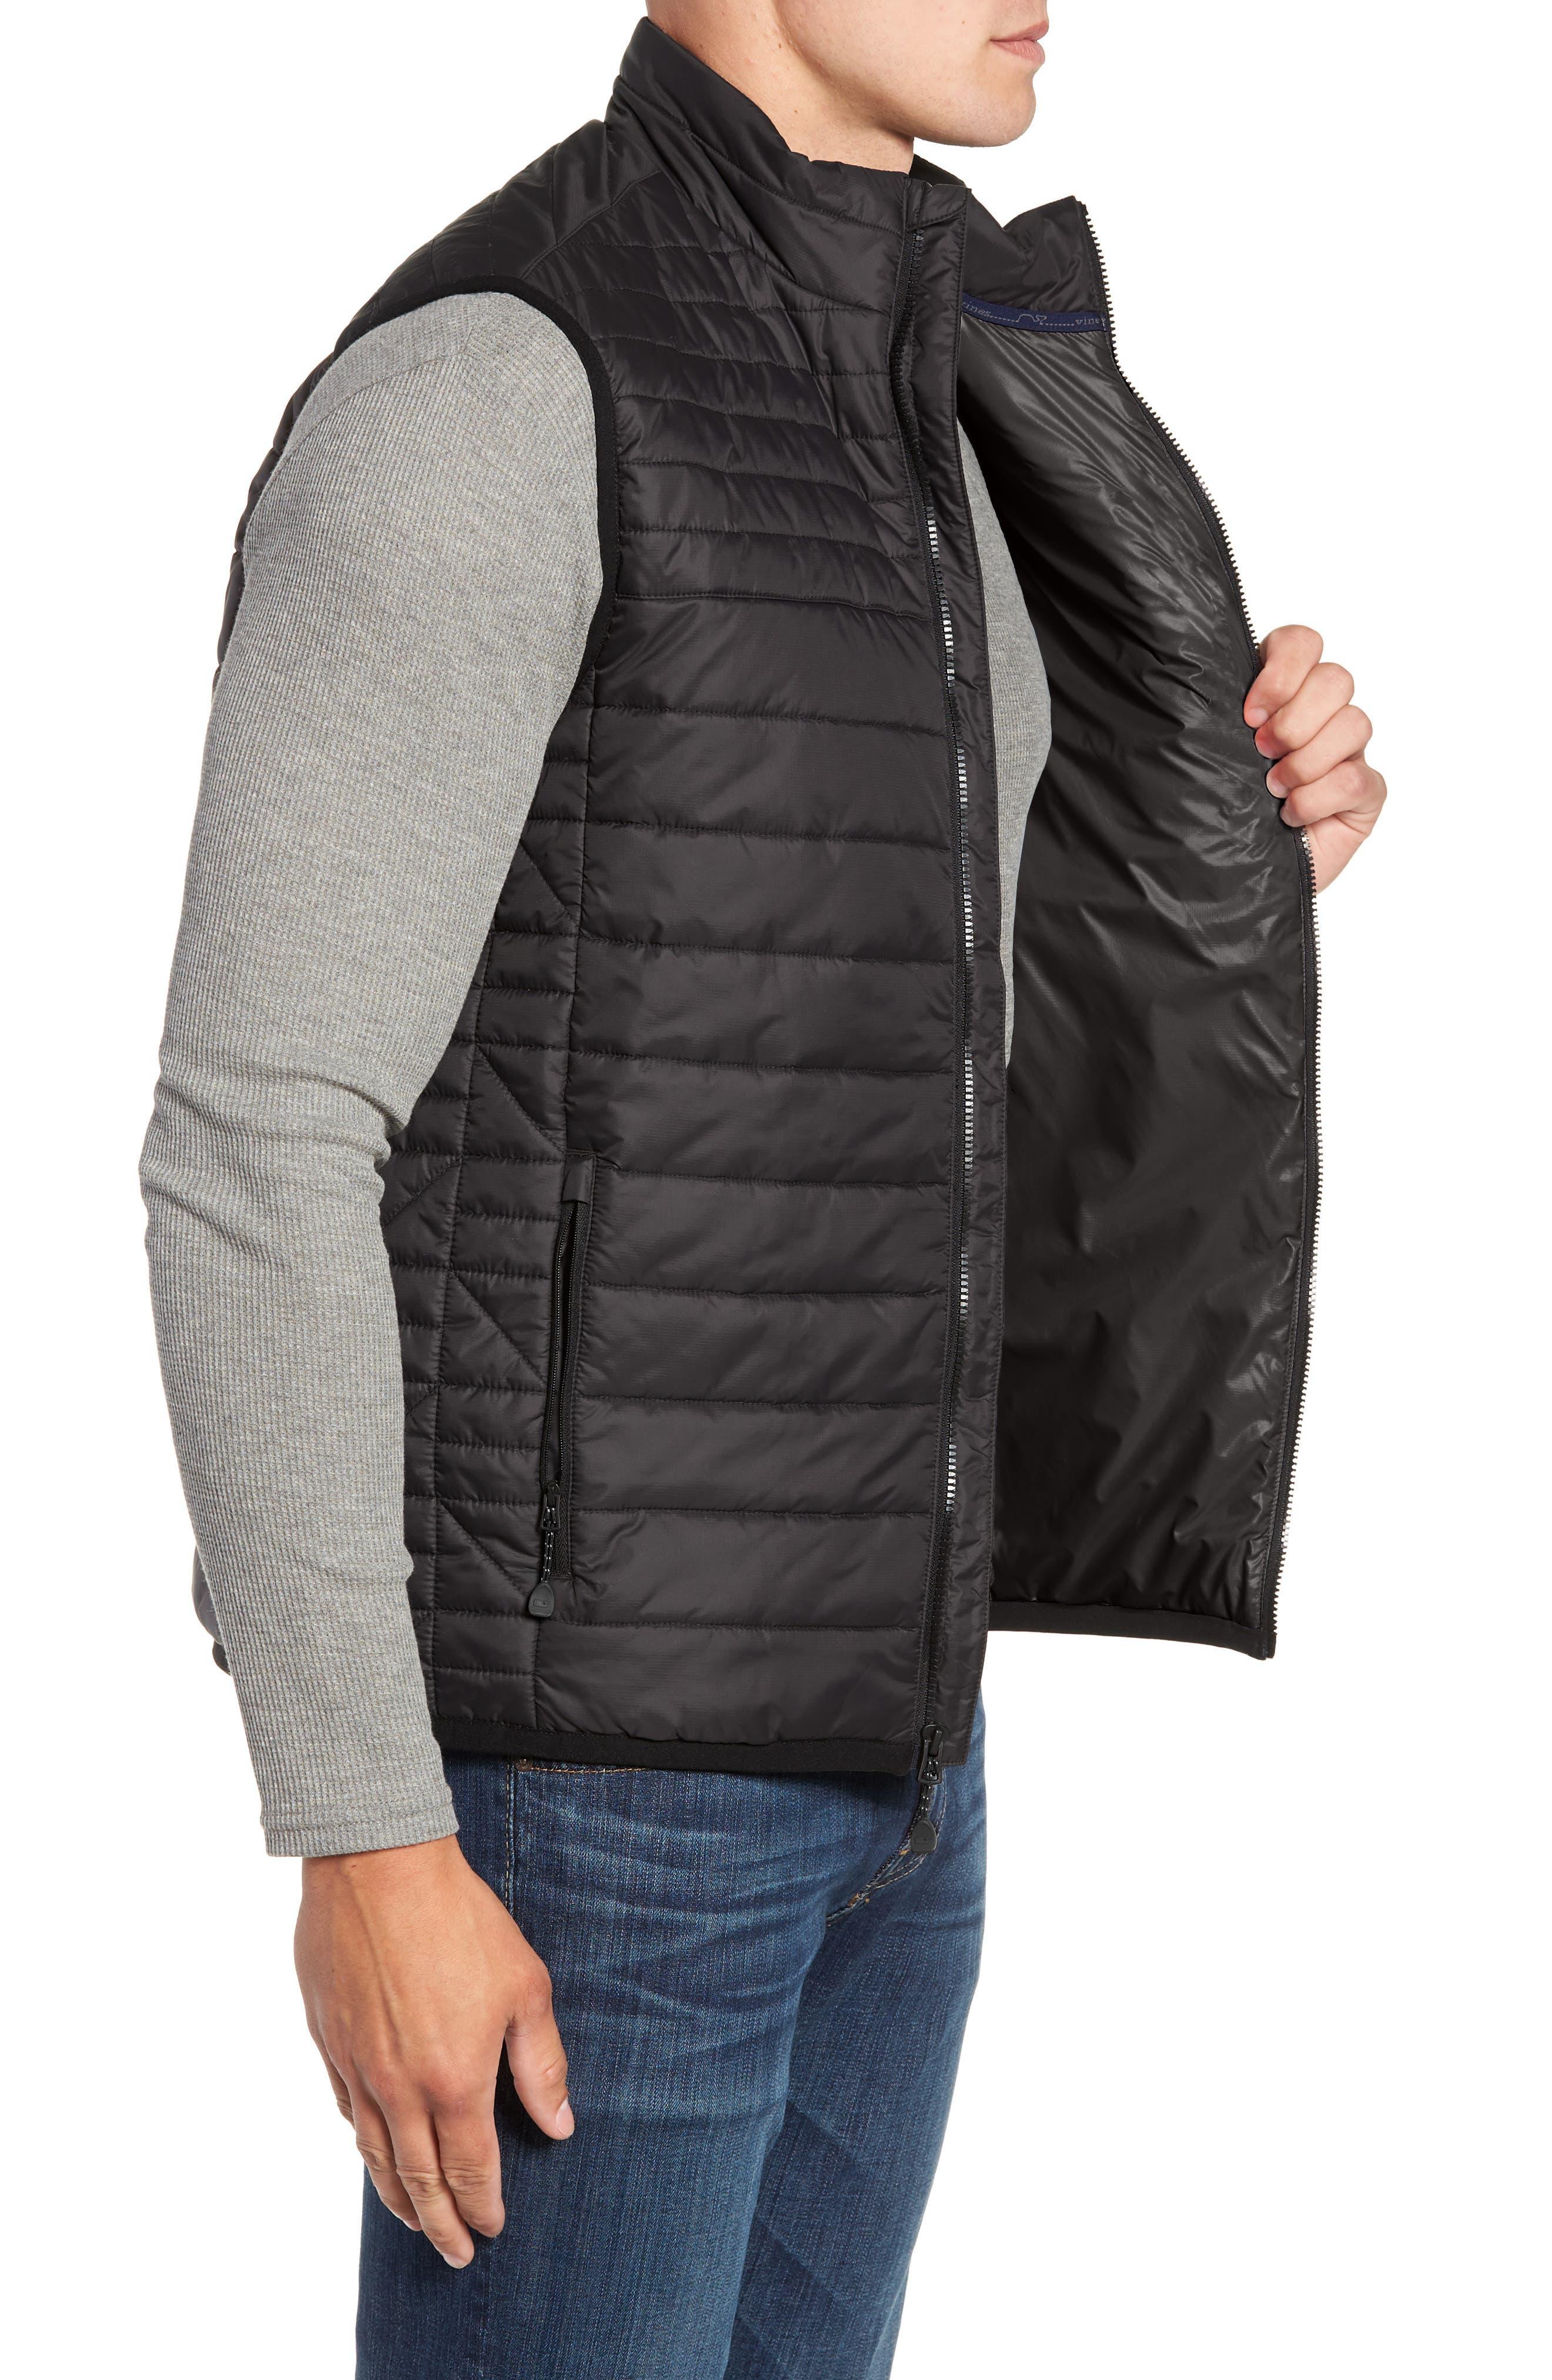 VINEYARD VINES,                             Regular Fit Down Mountain Vest,                             Alternate thumbnail 3, color,                             002